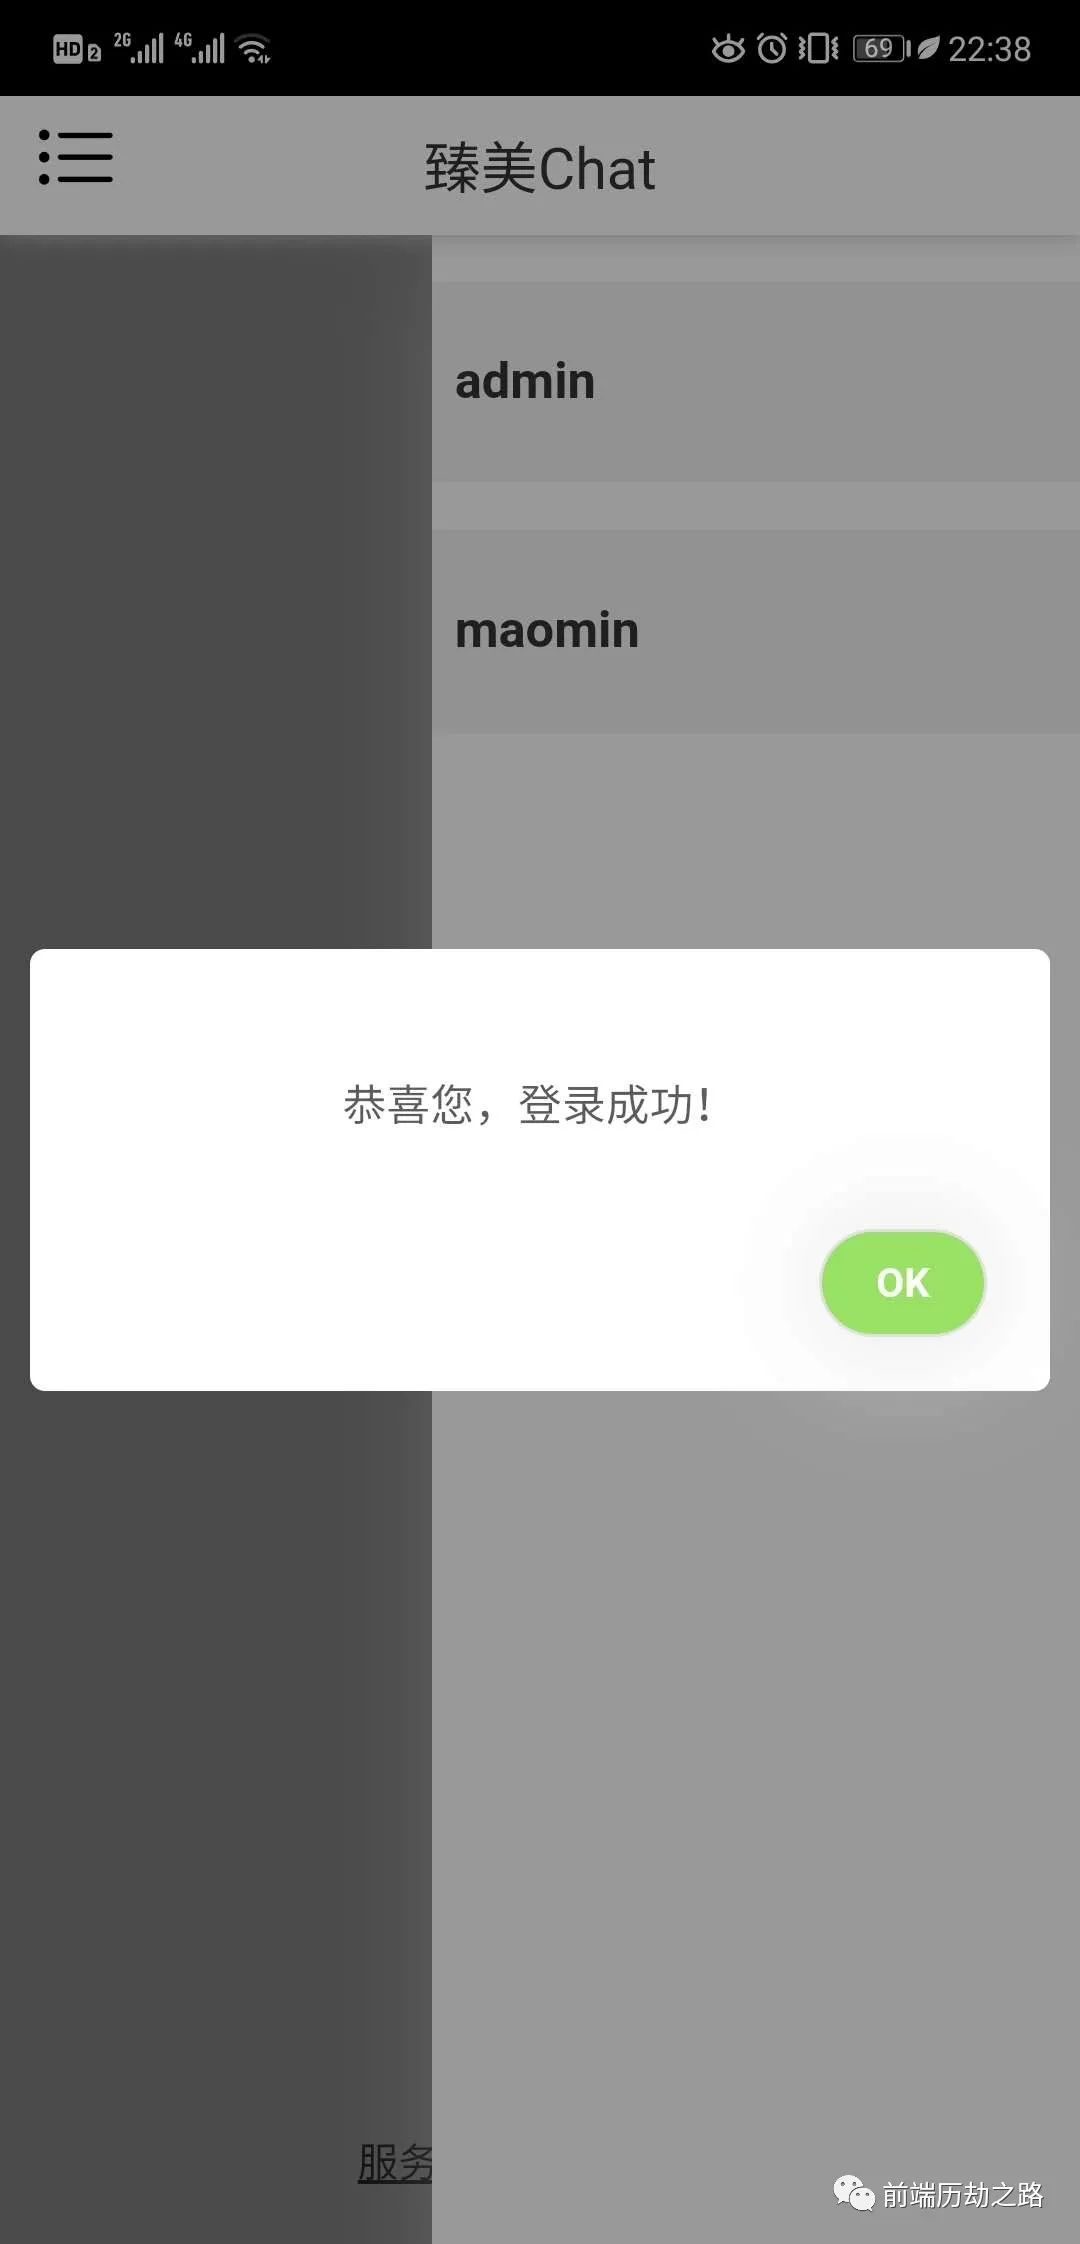 JavaScript与Node.js一起打造一款聊天App